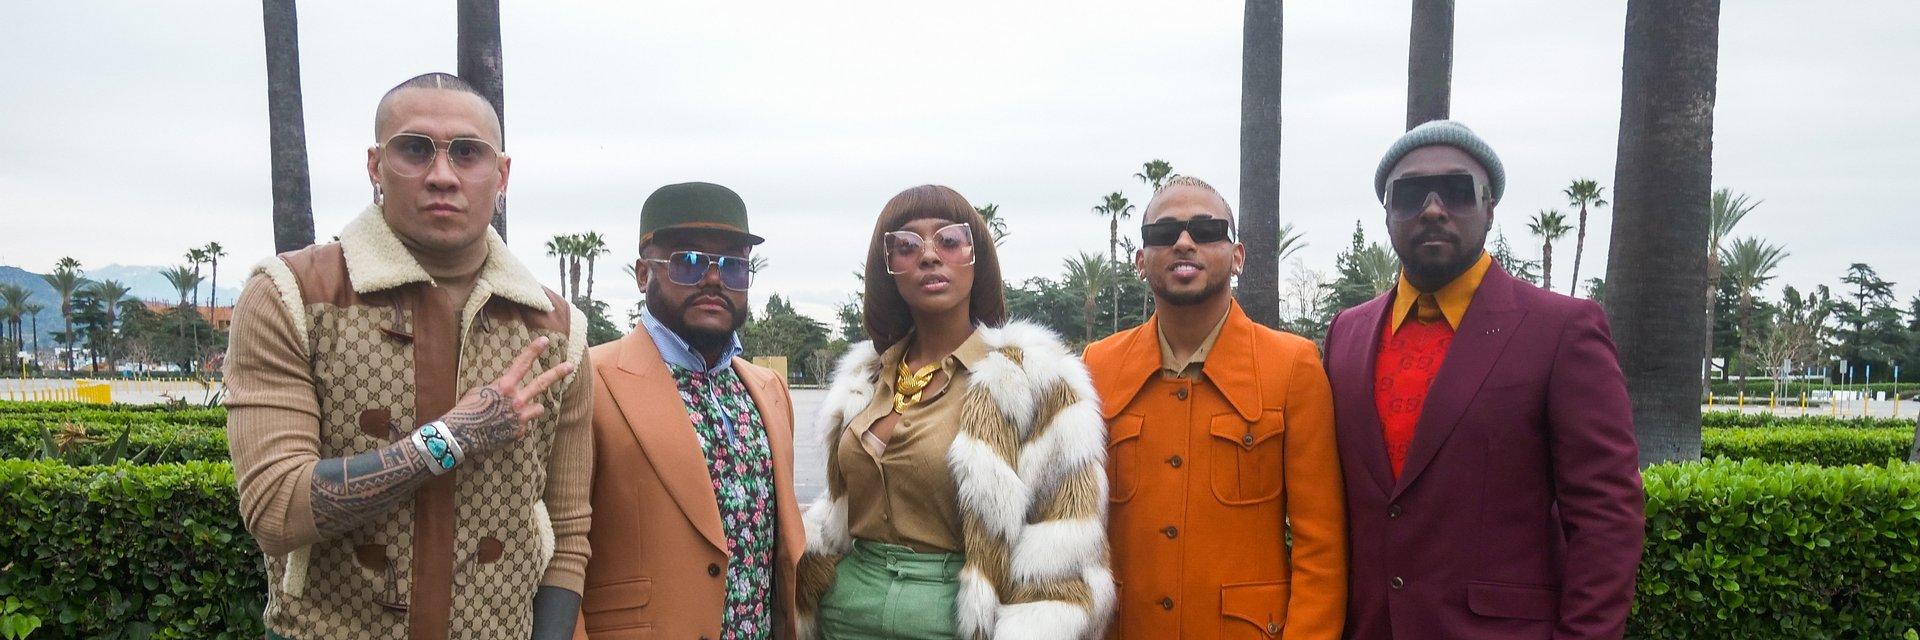 MAMACITA - kolejny hit od Black Eyed Peas?